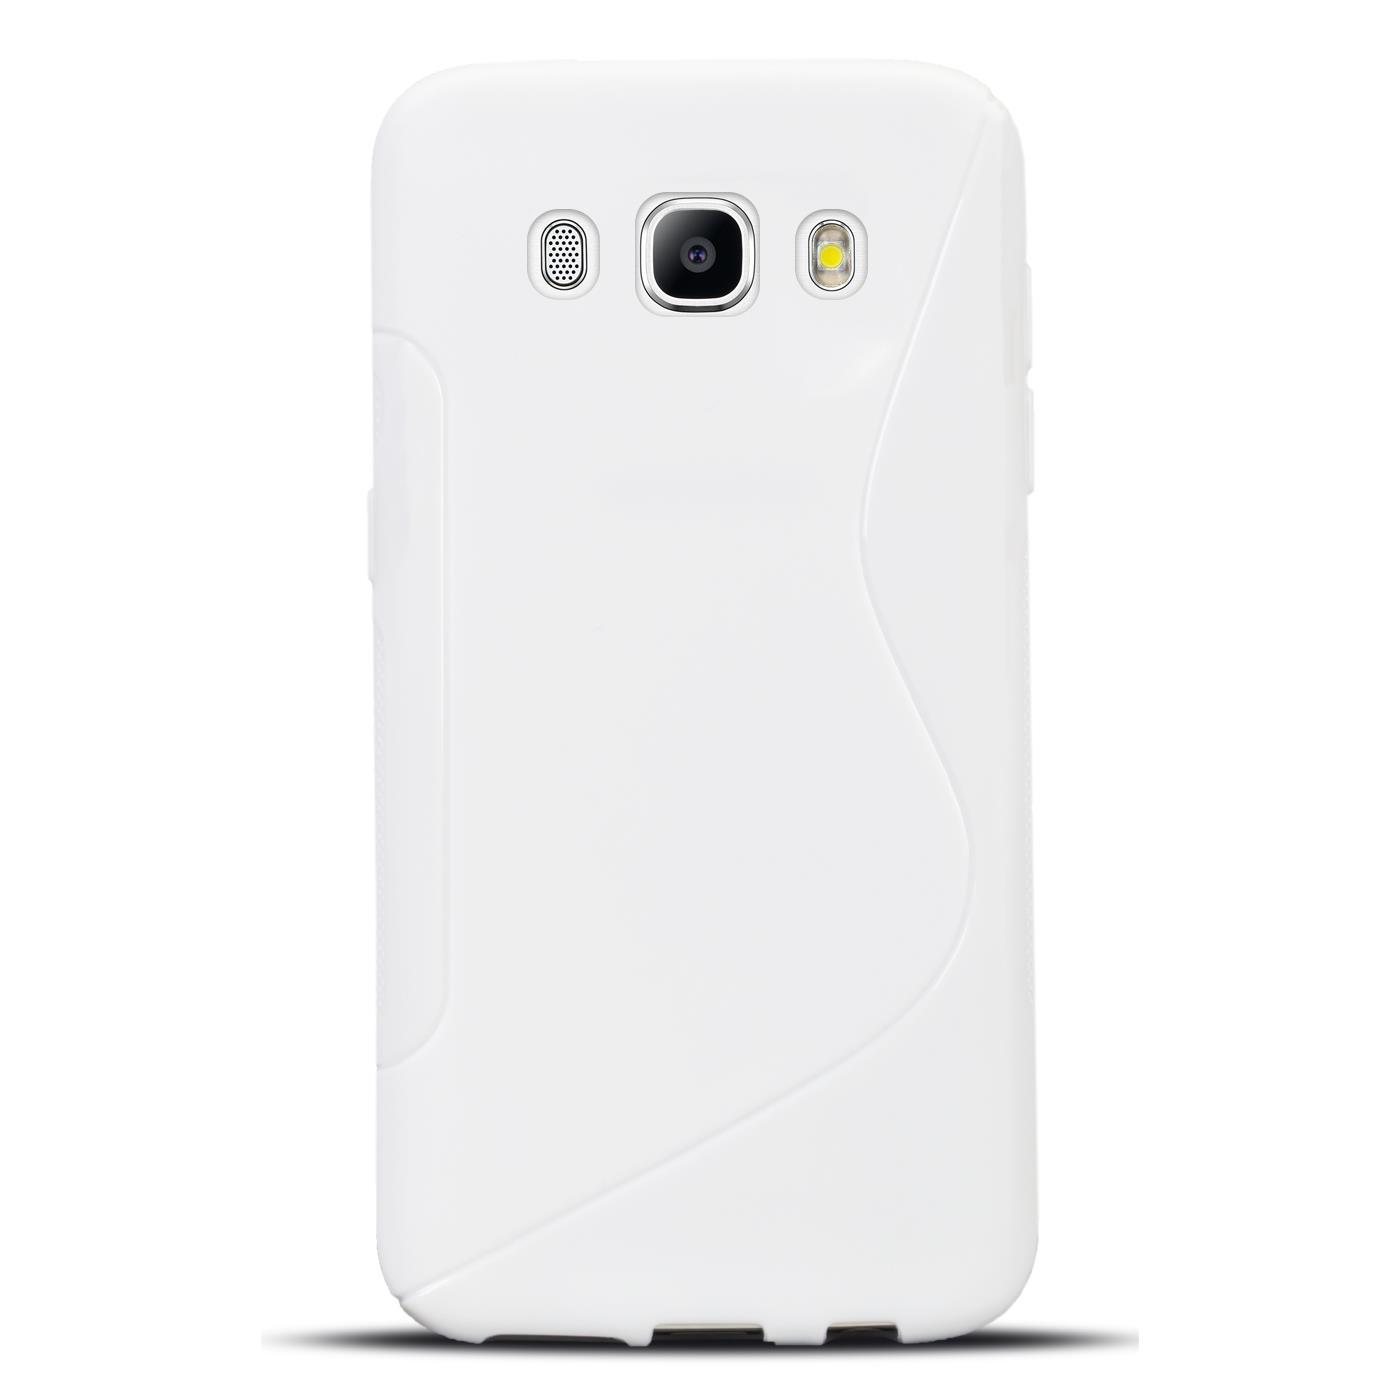 Samsung-Galaxy-j7-2016-Silikon-Gel-S-Line-Case-Cover-Duenn-Slim-Back-Bumper Indexbild 28